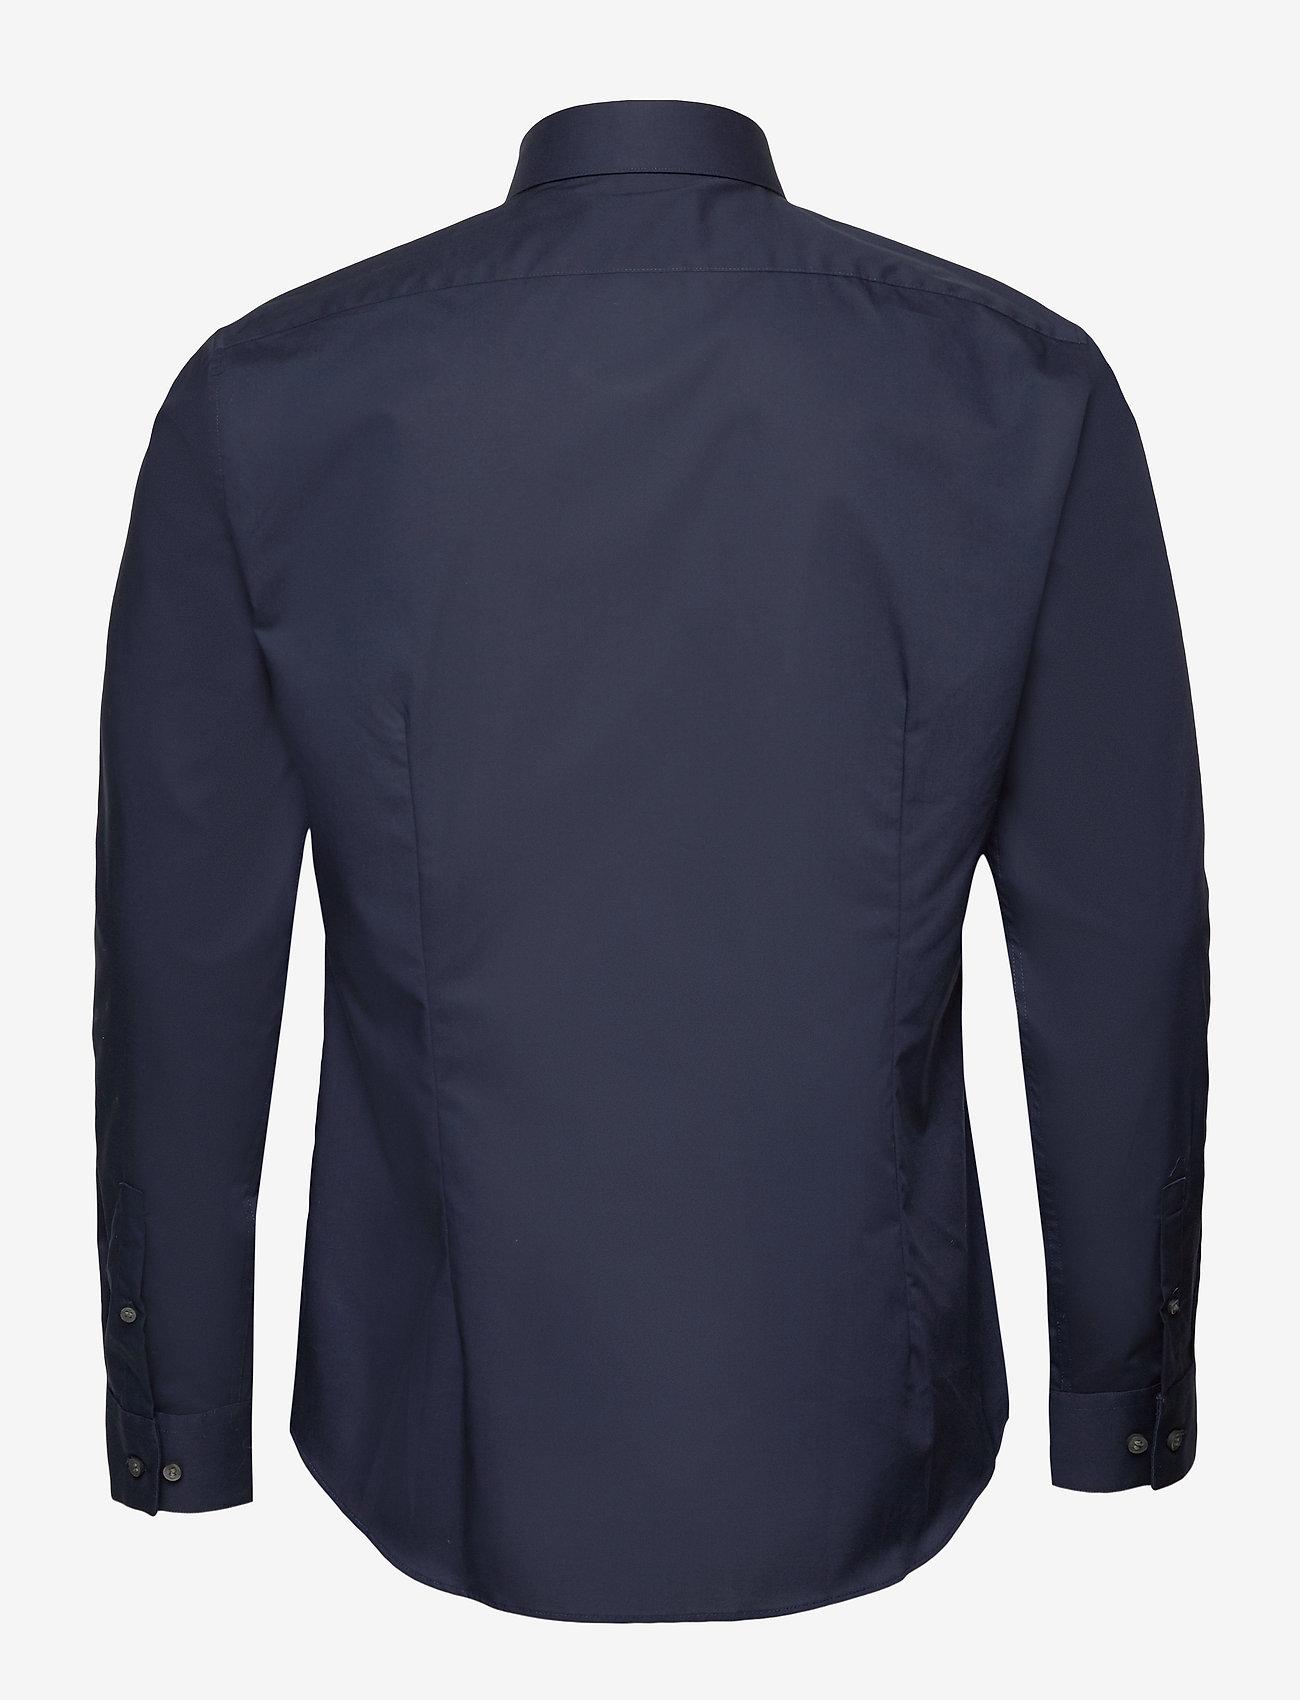 Calvin Klein - 2PLY POPLIN STRETCH SLIM SHIRT - basic shirts - midnight blue - 1